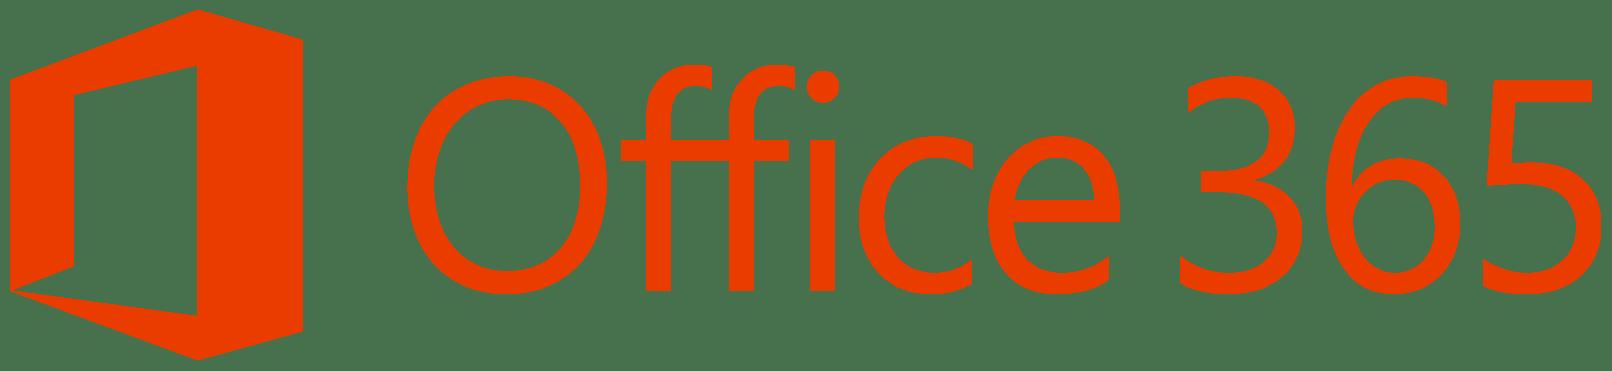 Setup a Staff Rota Using Microsoft 365